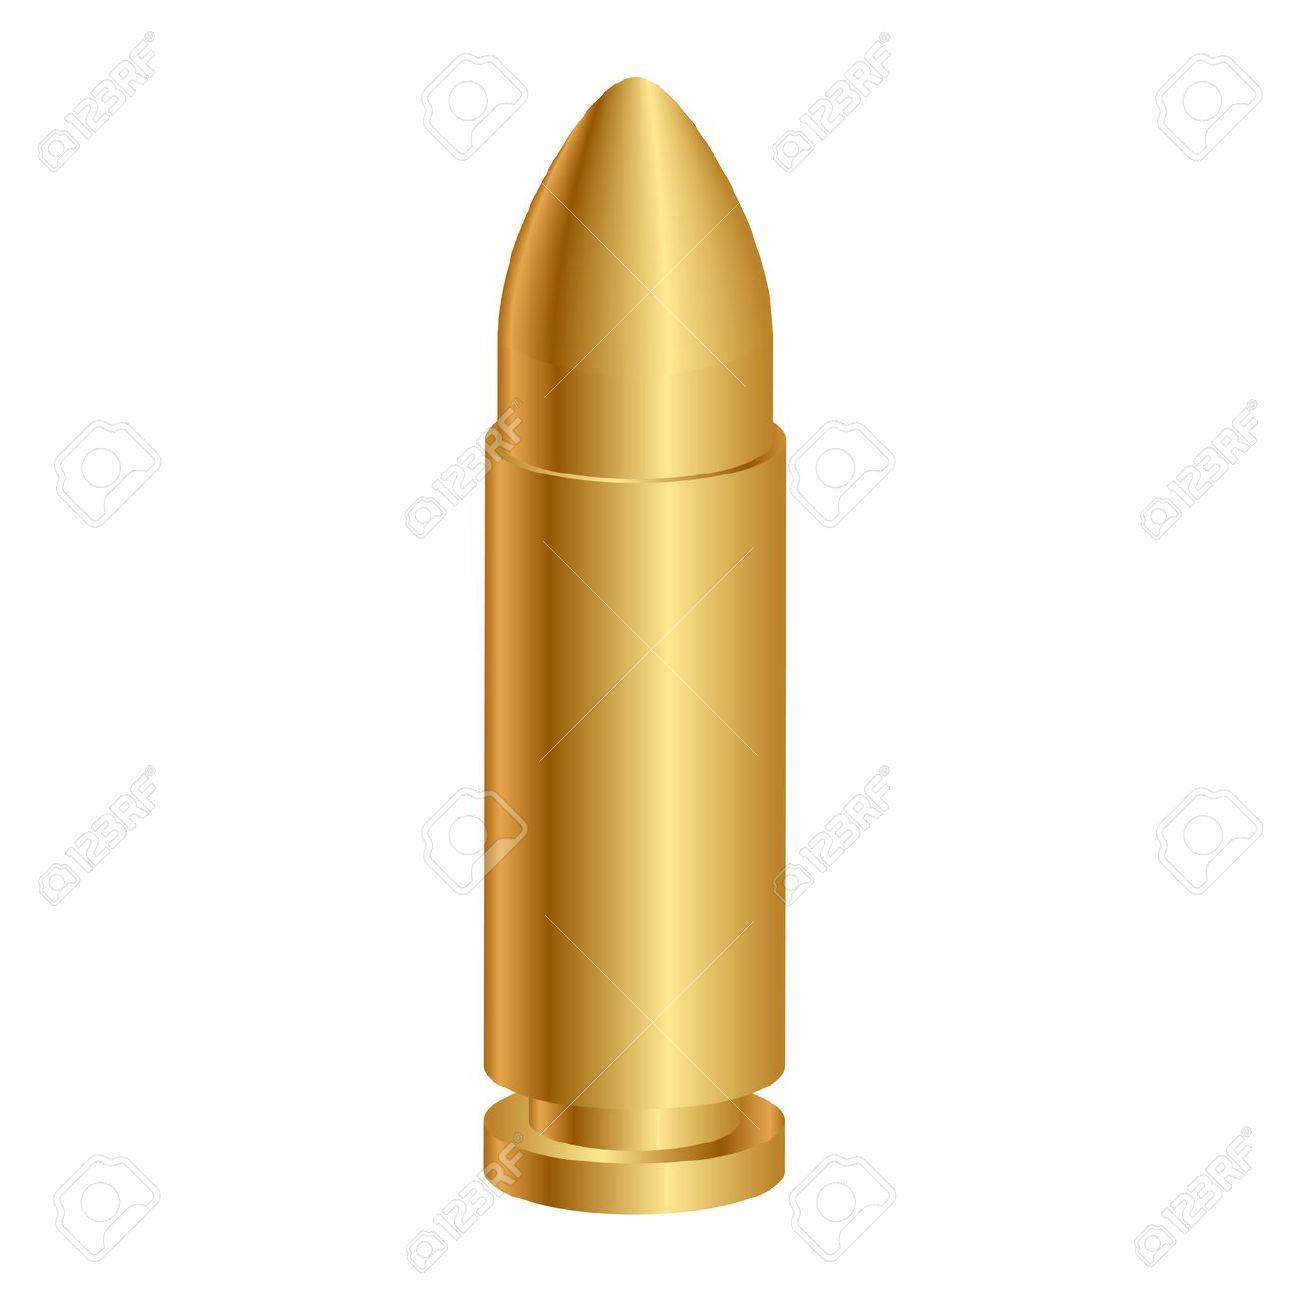 Vector Illustration Of 3d Bullet Royalty Free Cliparts, Vectors.